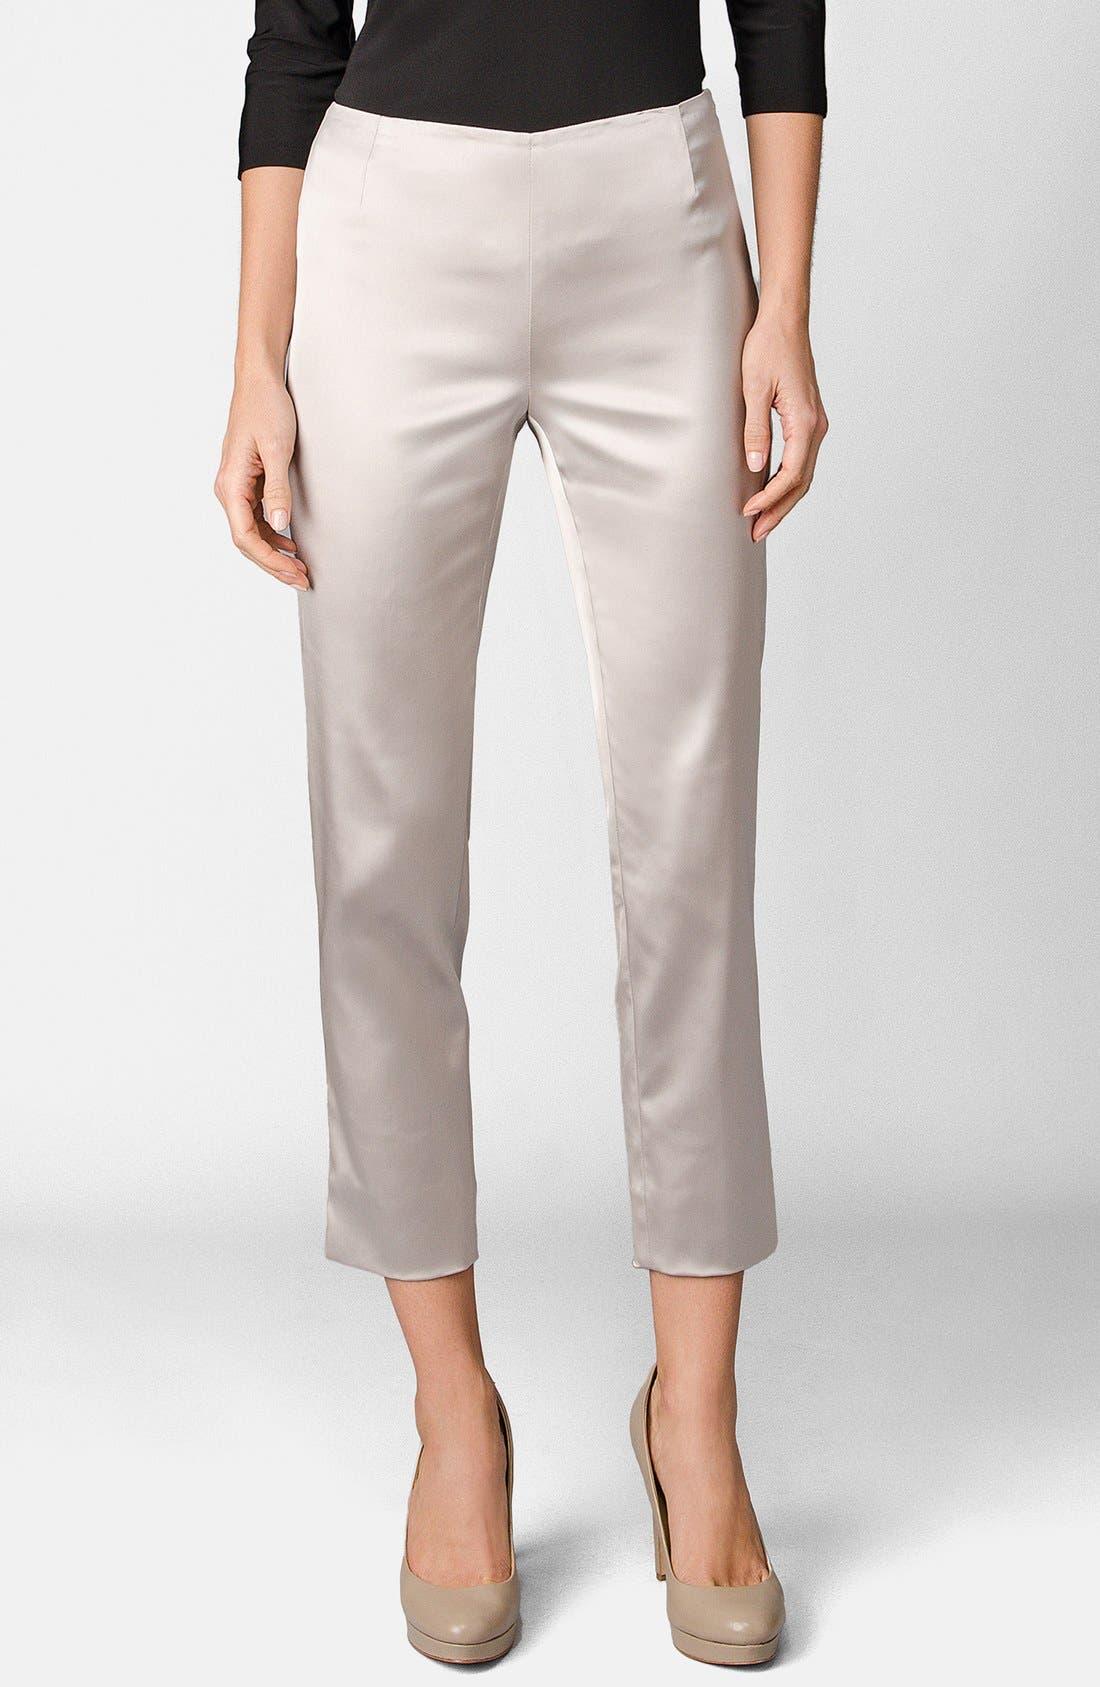 Alternate Image 1 Selected - Lafayette 148 New York 'Stanton - Belle Satin' Pants